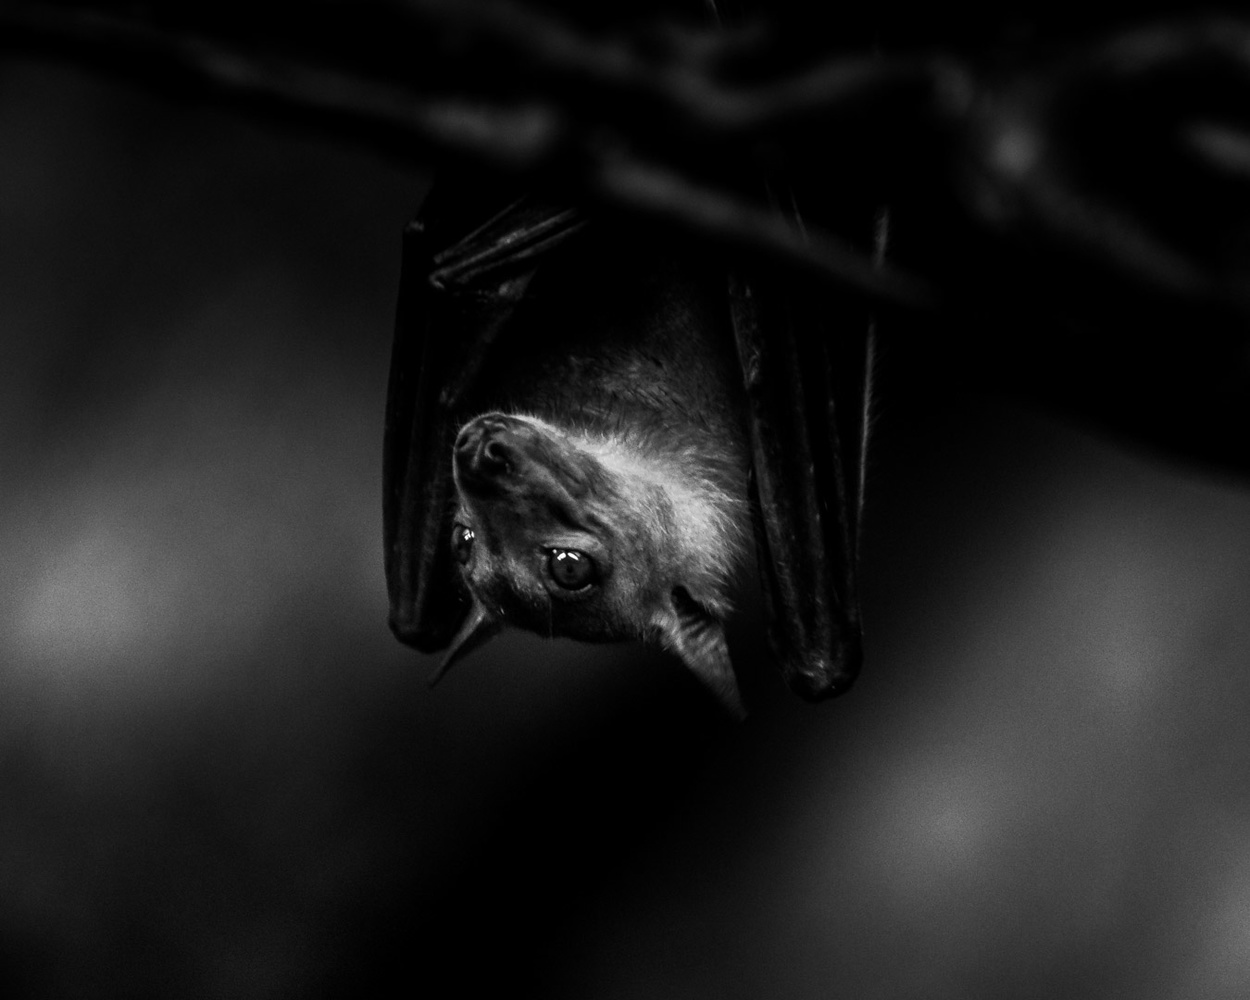 Bat by Mike Esparza